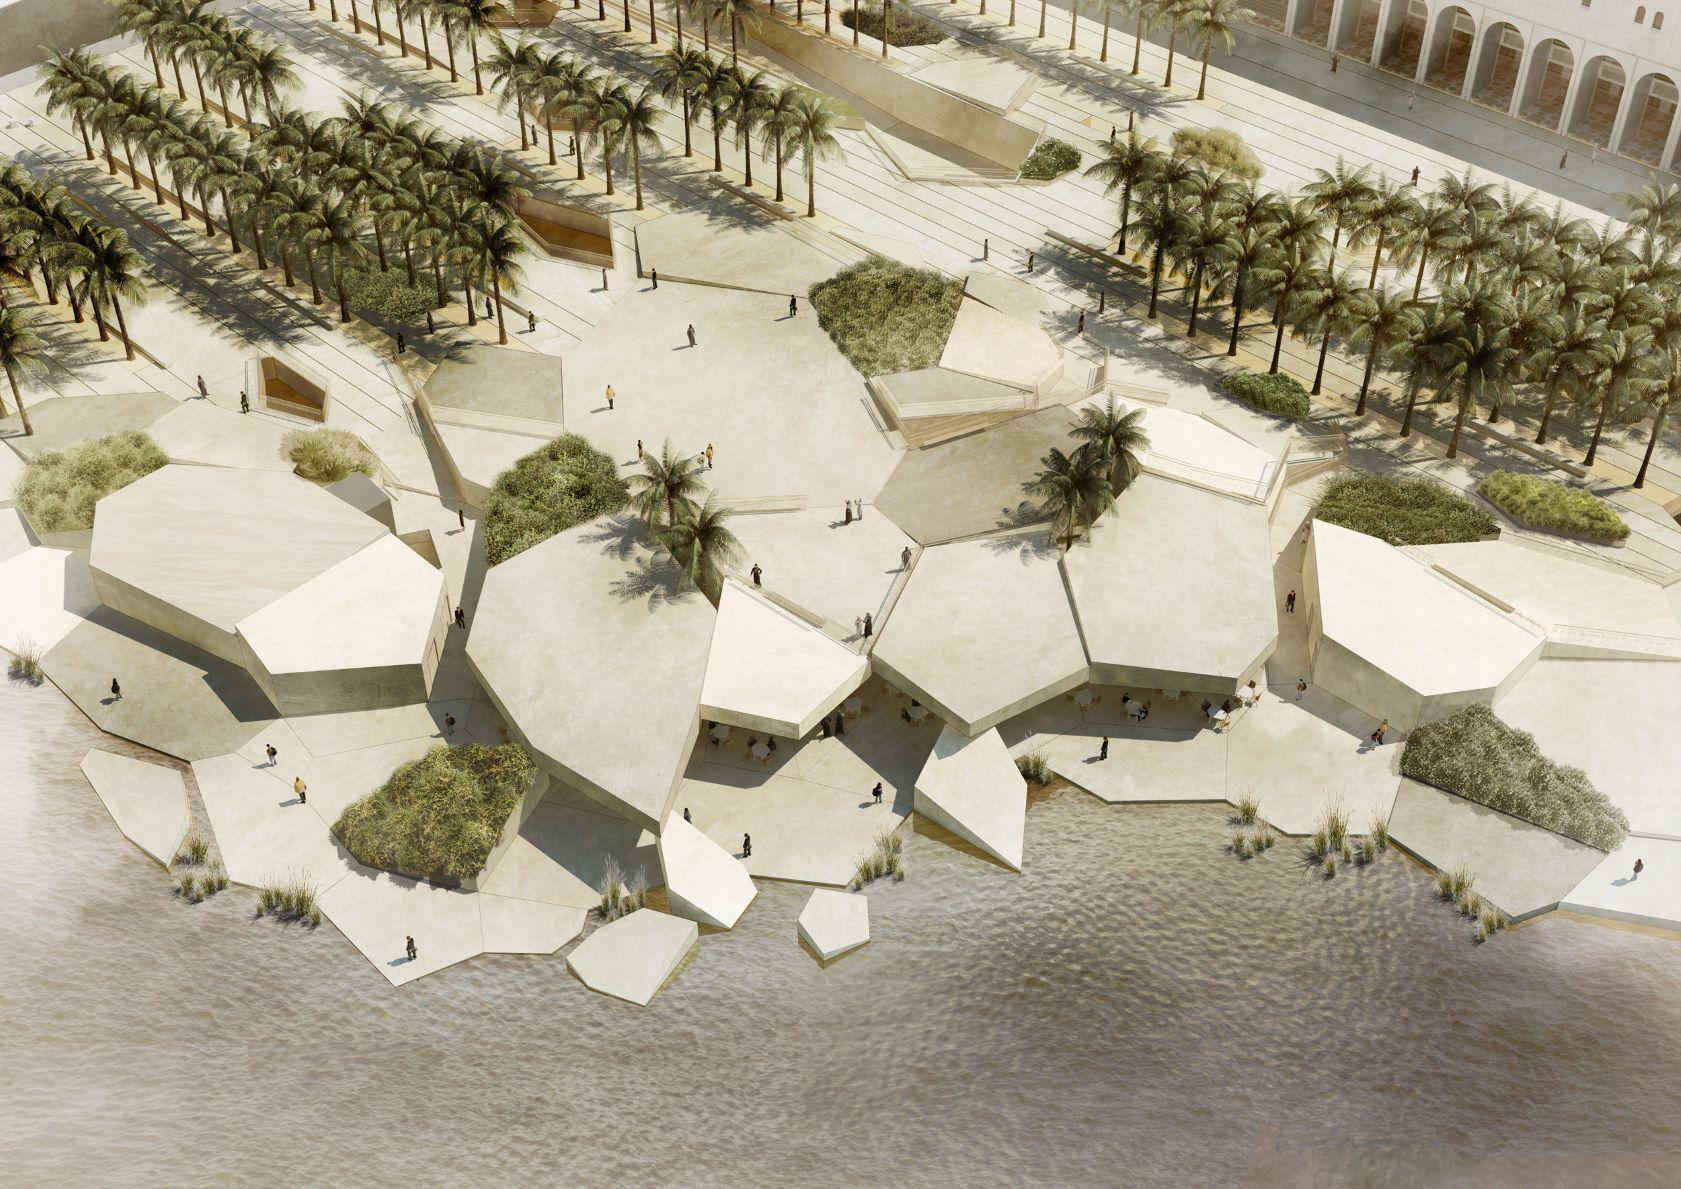 9. Rendering of Al Hosn site, Abu Dhabi. © Department of Culture and Tourism – Abu Dhabi.jpg